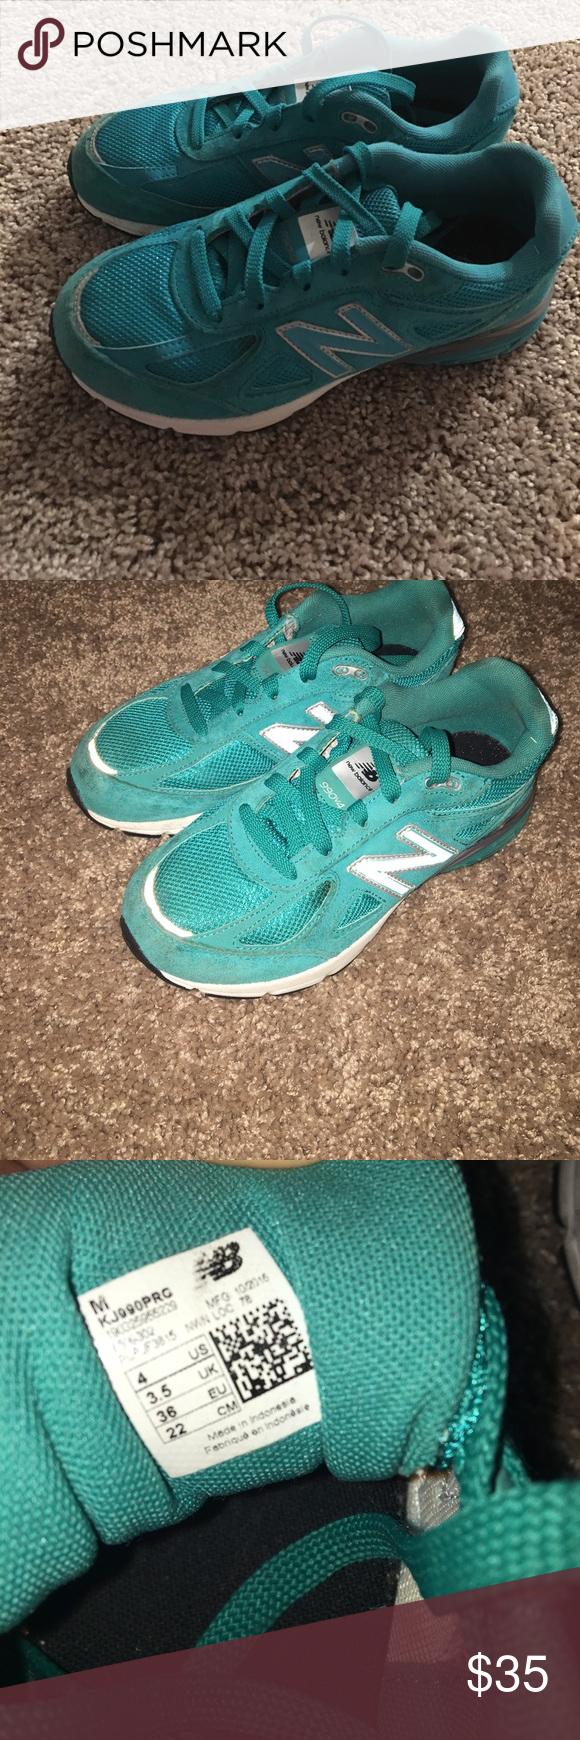 New Balance 990 v4 Turquoise (With